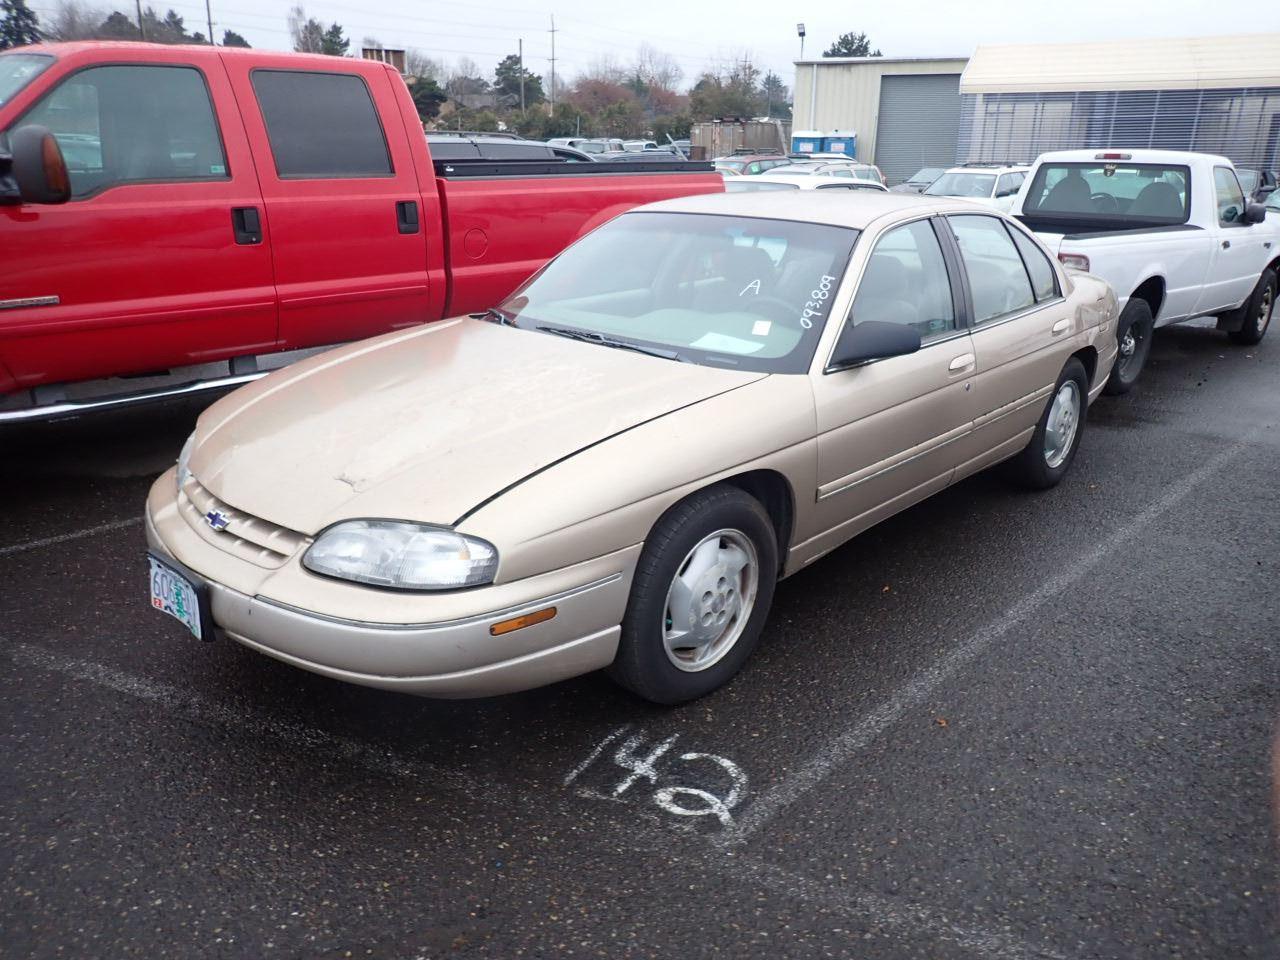 1998 chevrolet lumina speeds auto auctions 1998 chevrolet lumina speeds auto